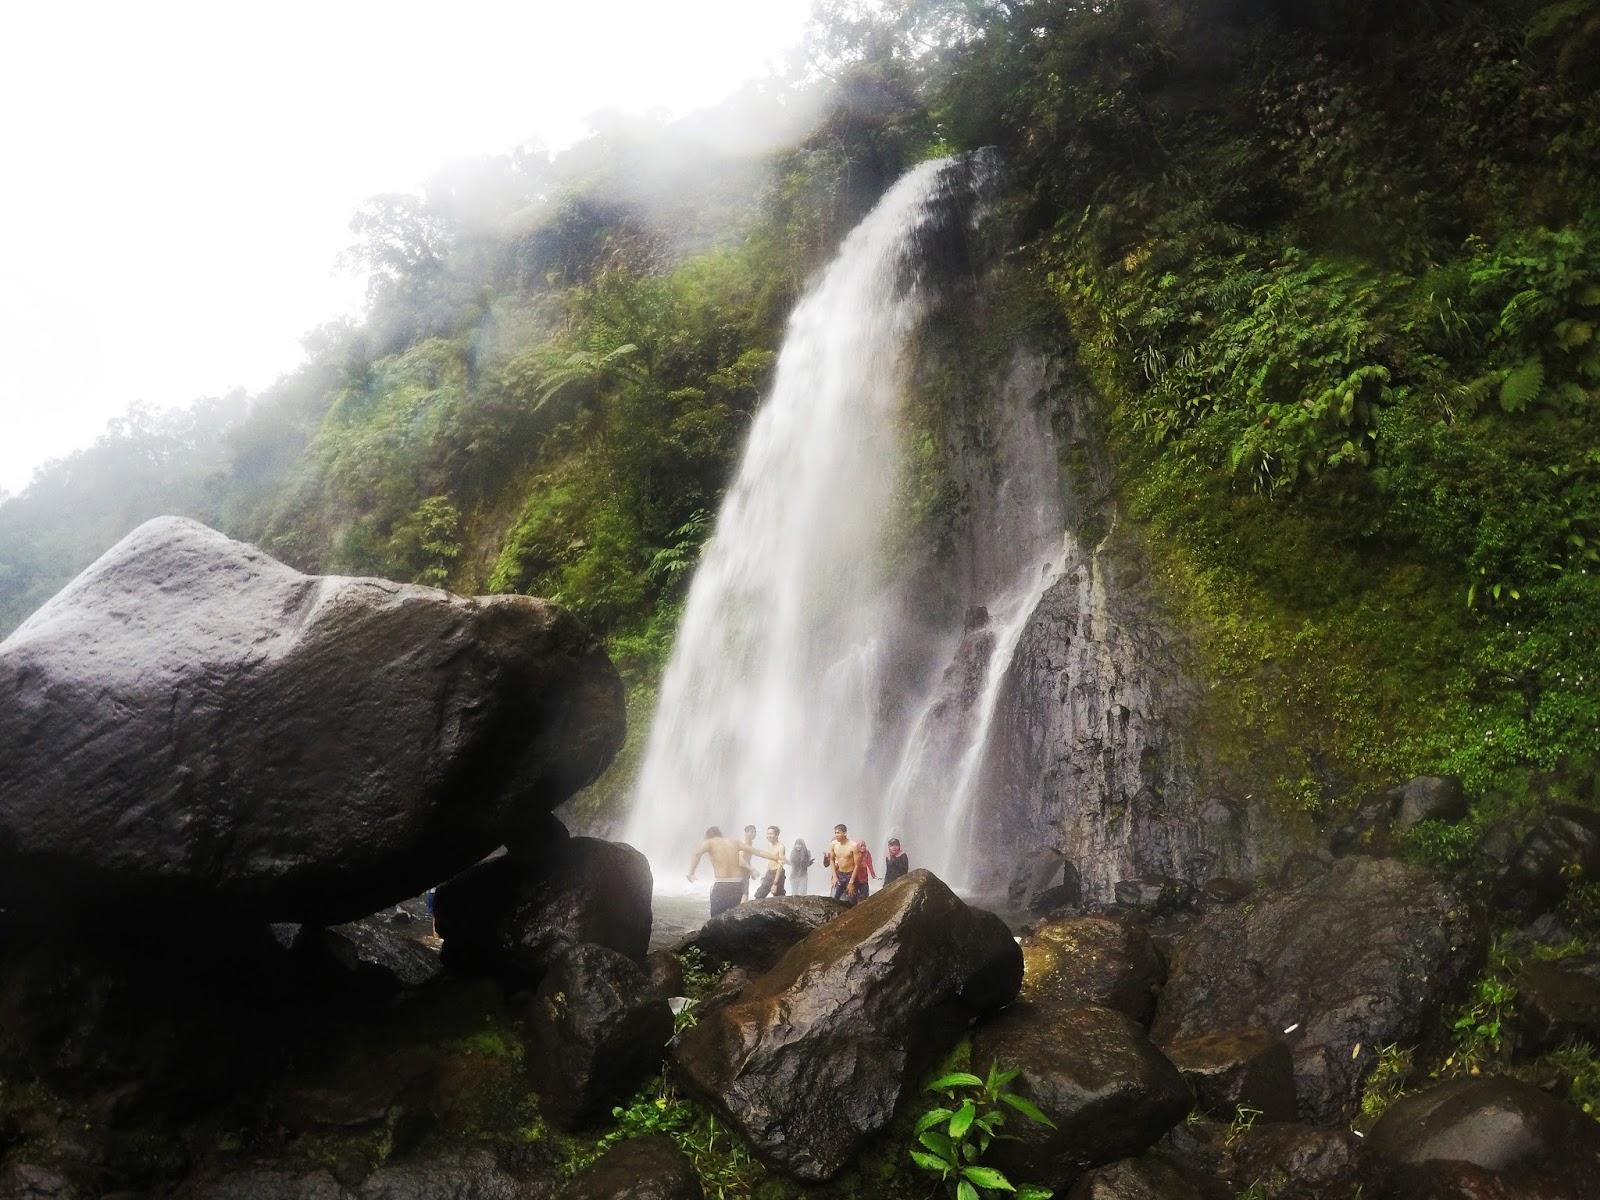 Air Terjun Gunung Gede